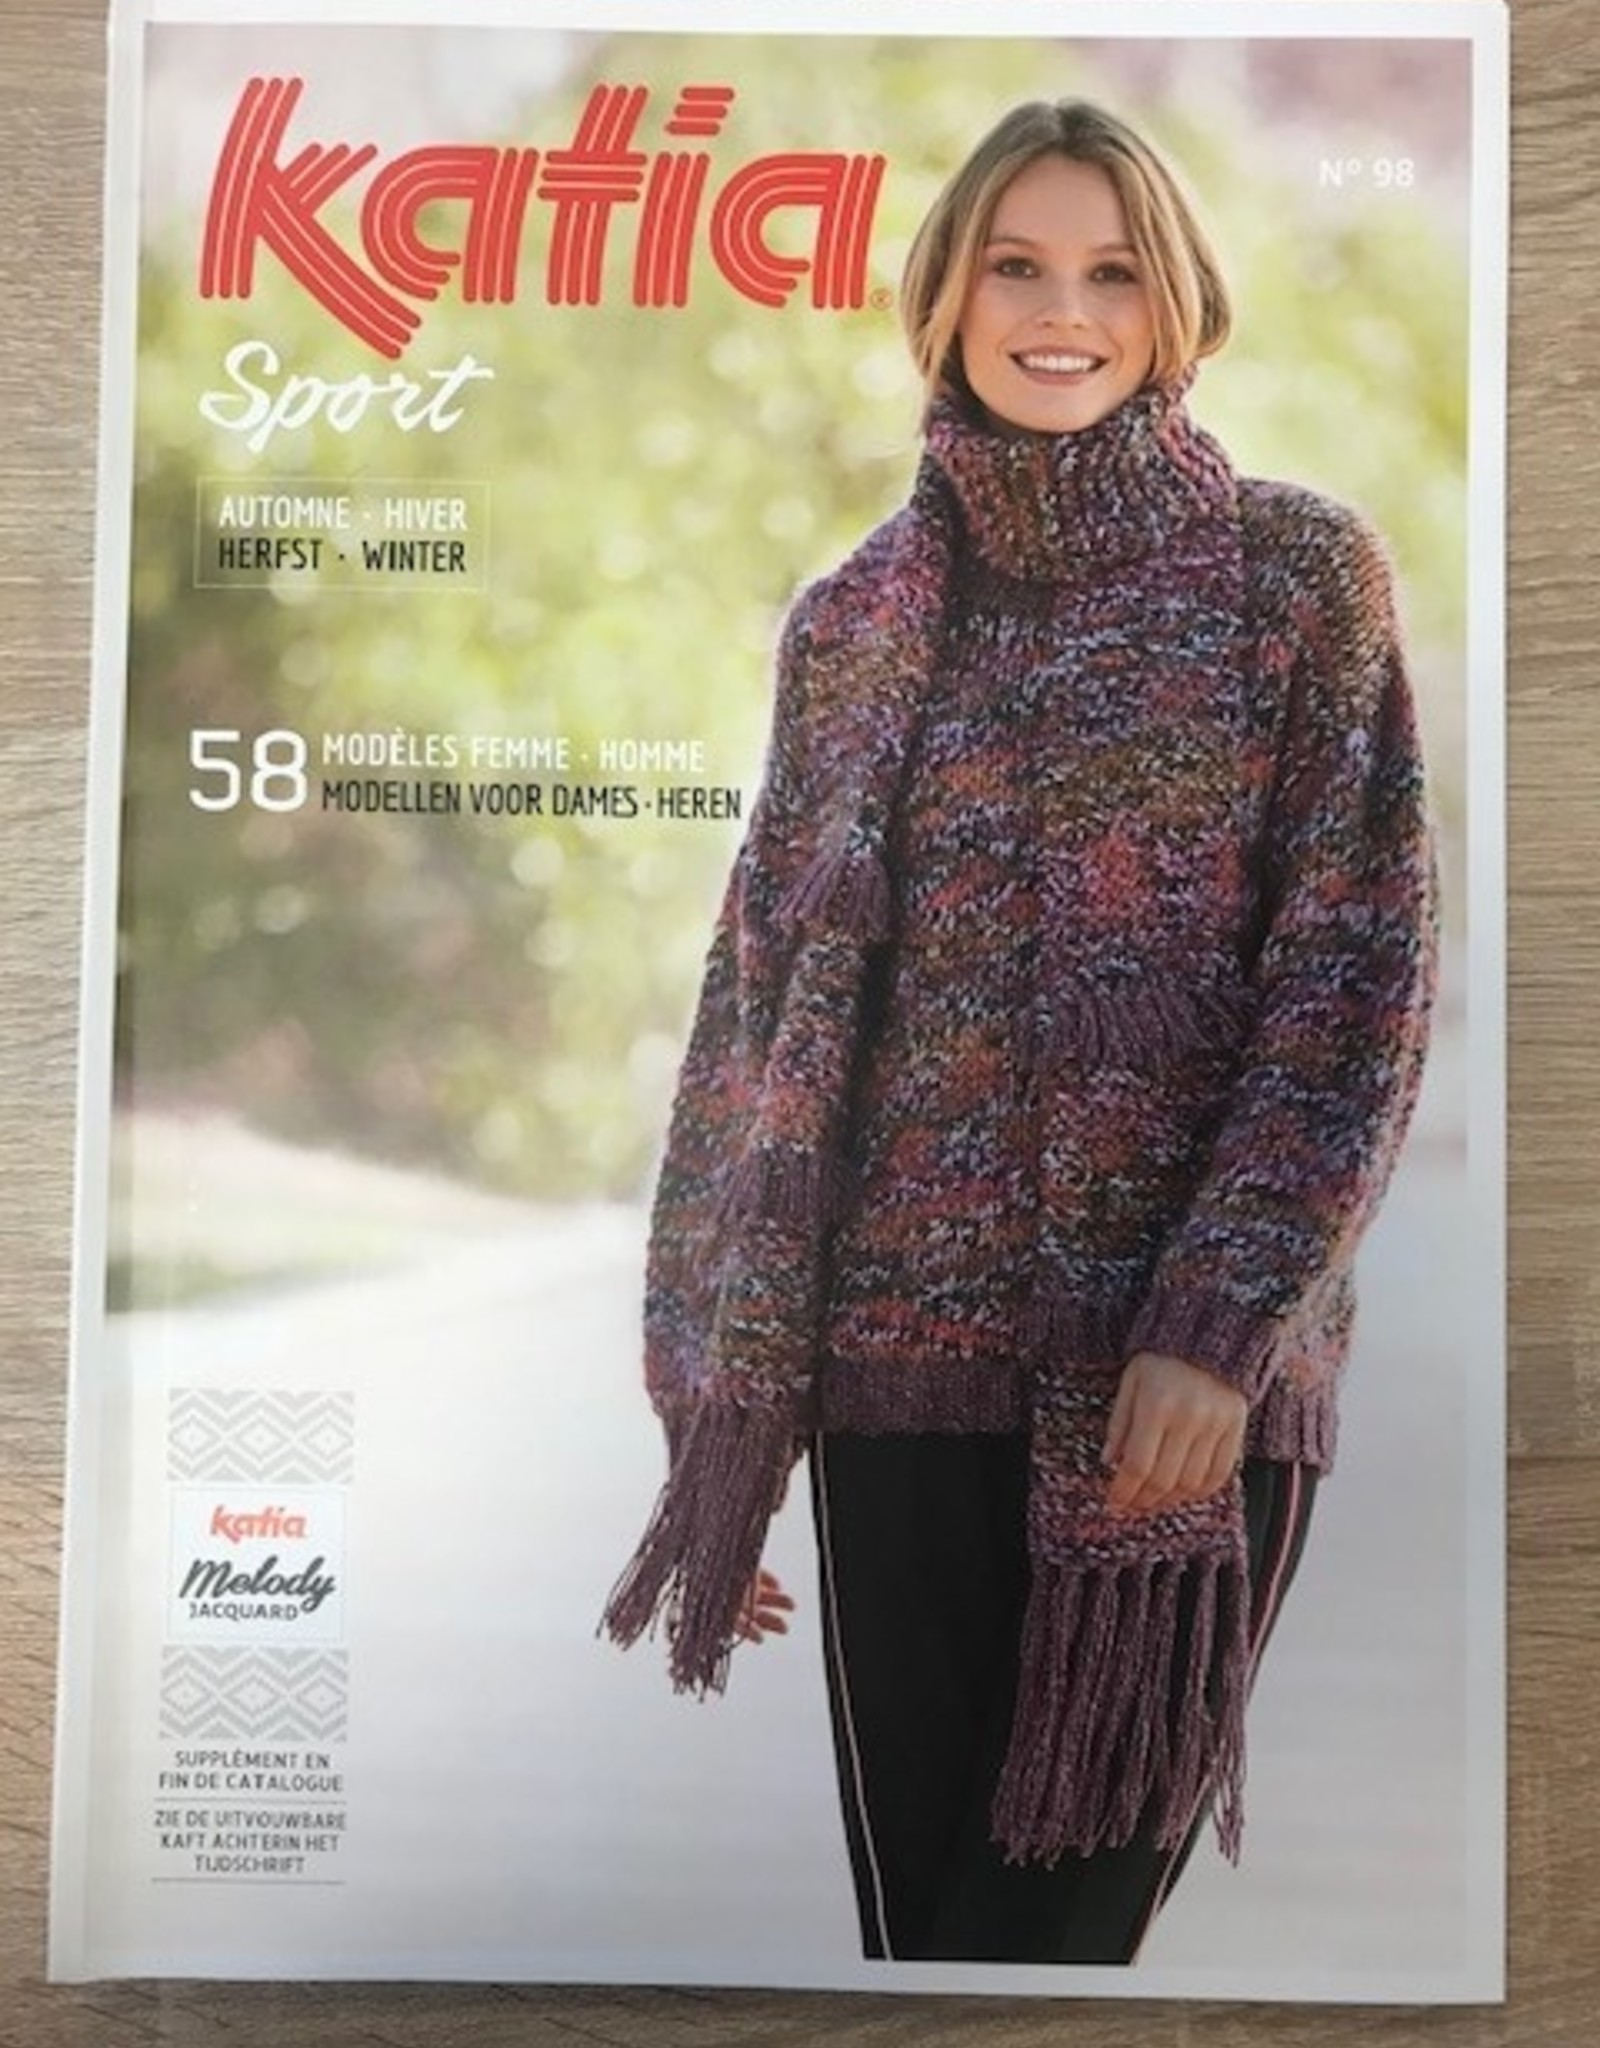 Magazine katia winter Nr 98